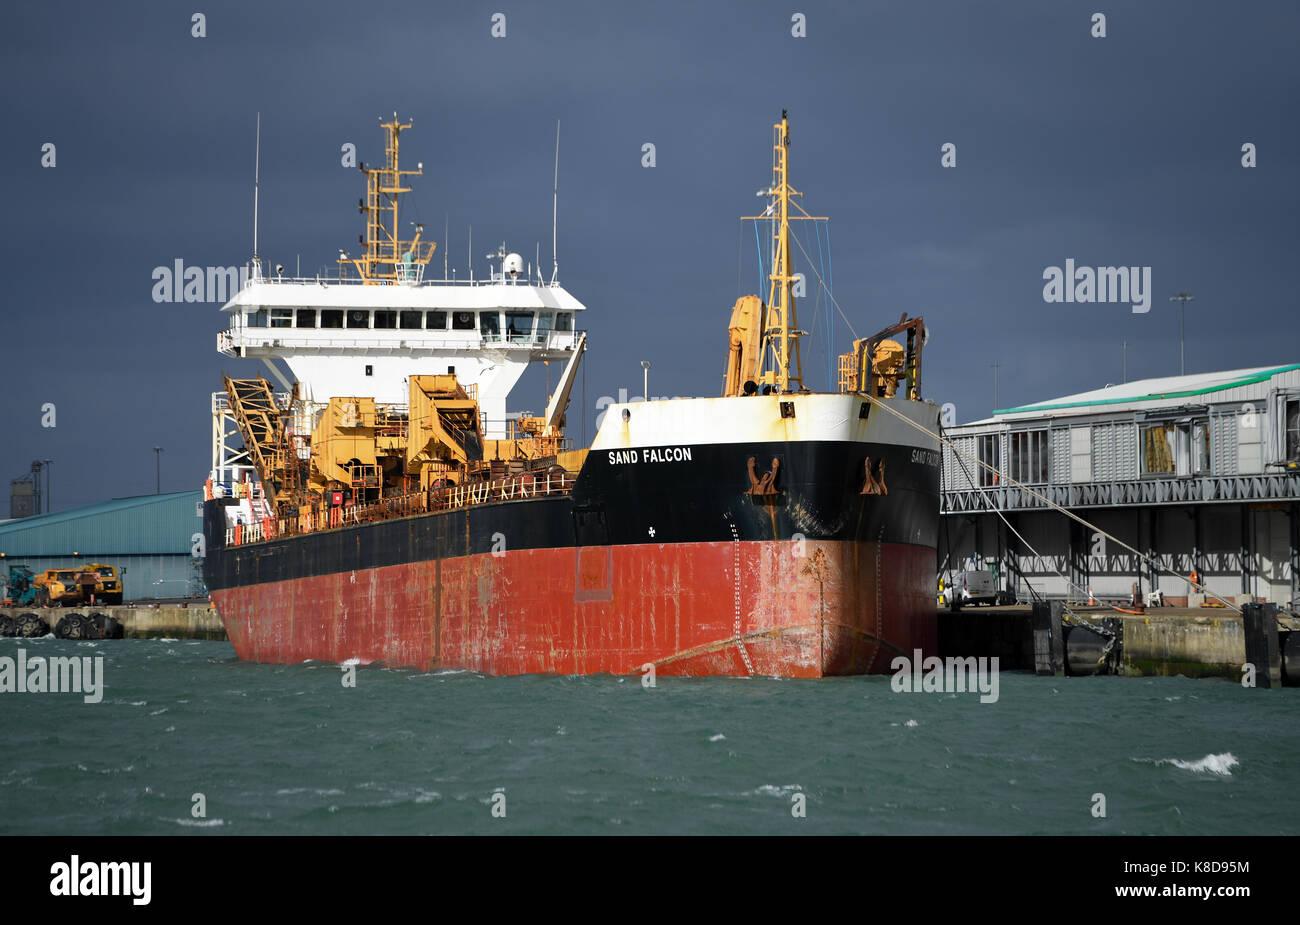 Sand Falcon hopper dredger docked at Southampton port - Stock Image